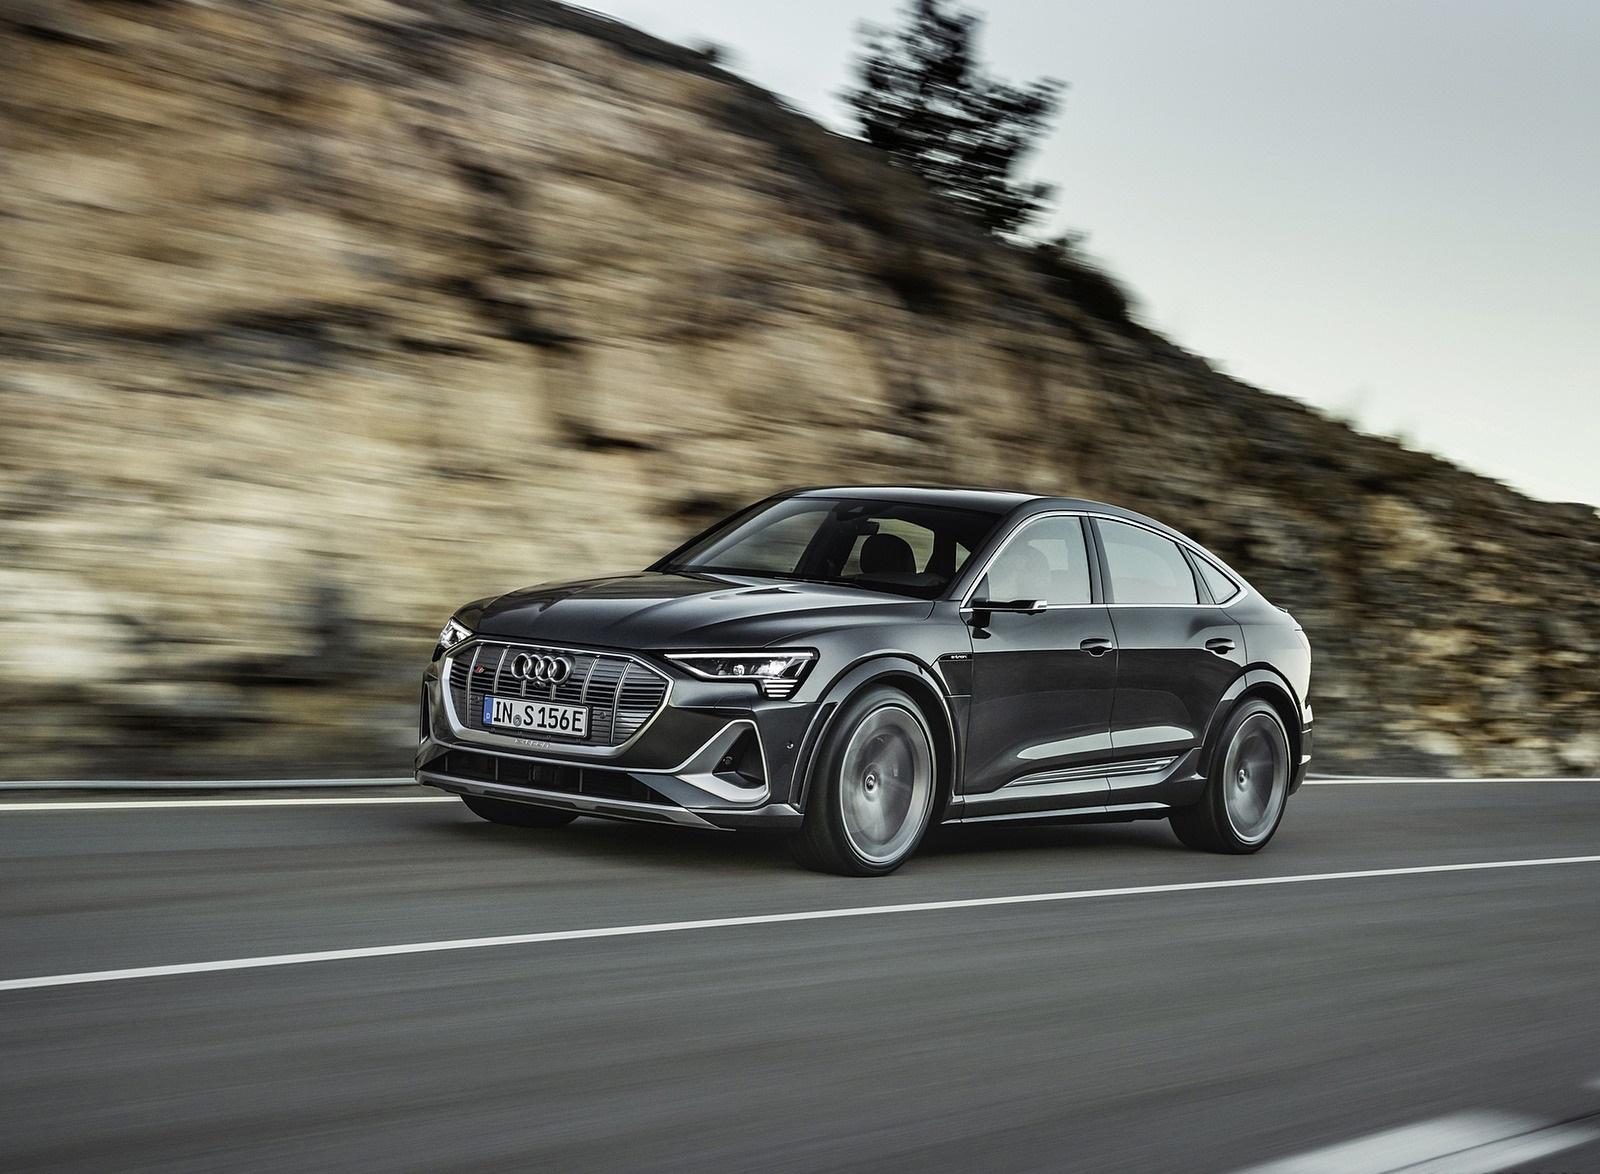 2021 Audi e-tron S Sportback (Color: Daytona Gray) Front Three-Quarter Wallpapers  (3)